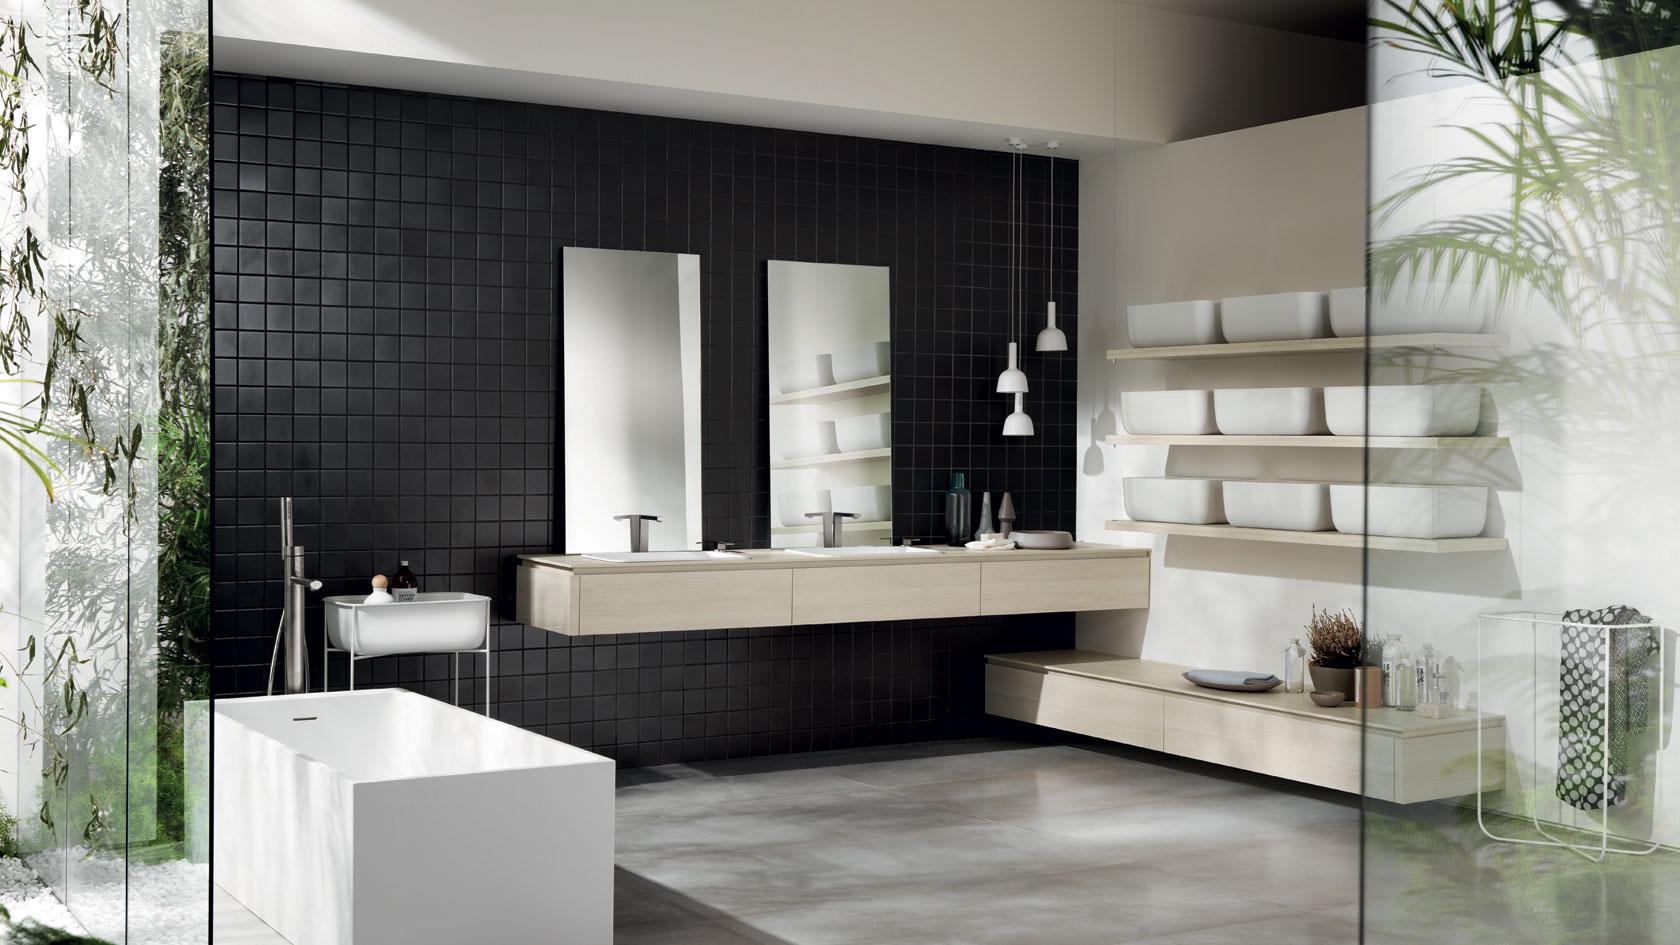 9433_Qi-bathroom-cabinets-scavolini-04.jpg